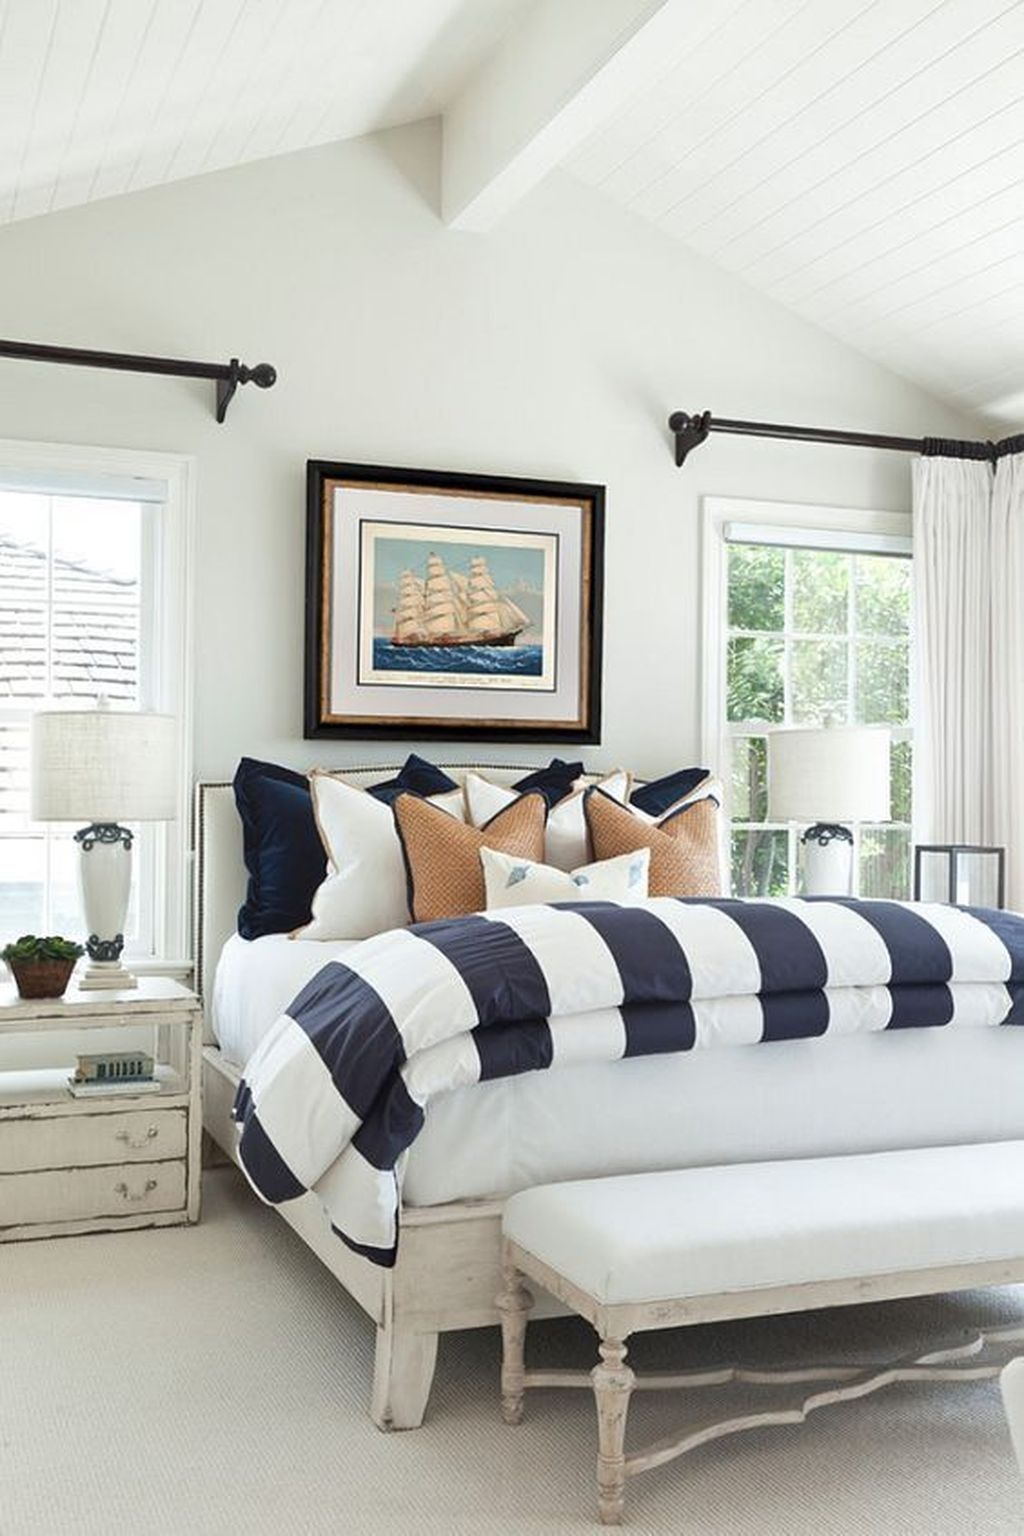 Pin by Eduardo on Quartos in 2020 Beach bedroom decor